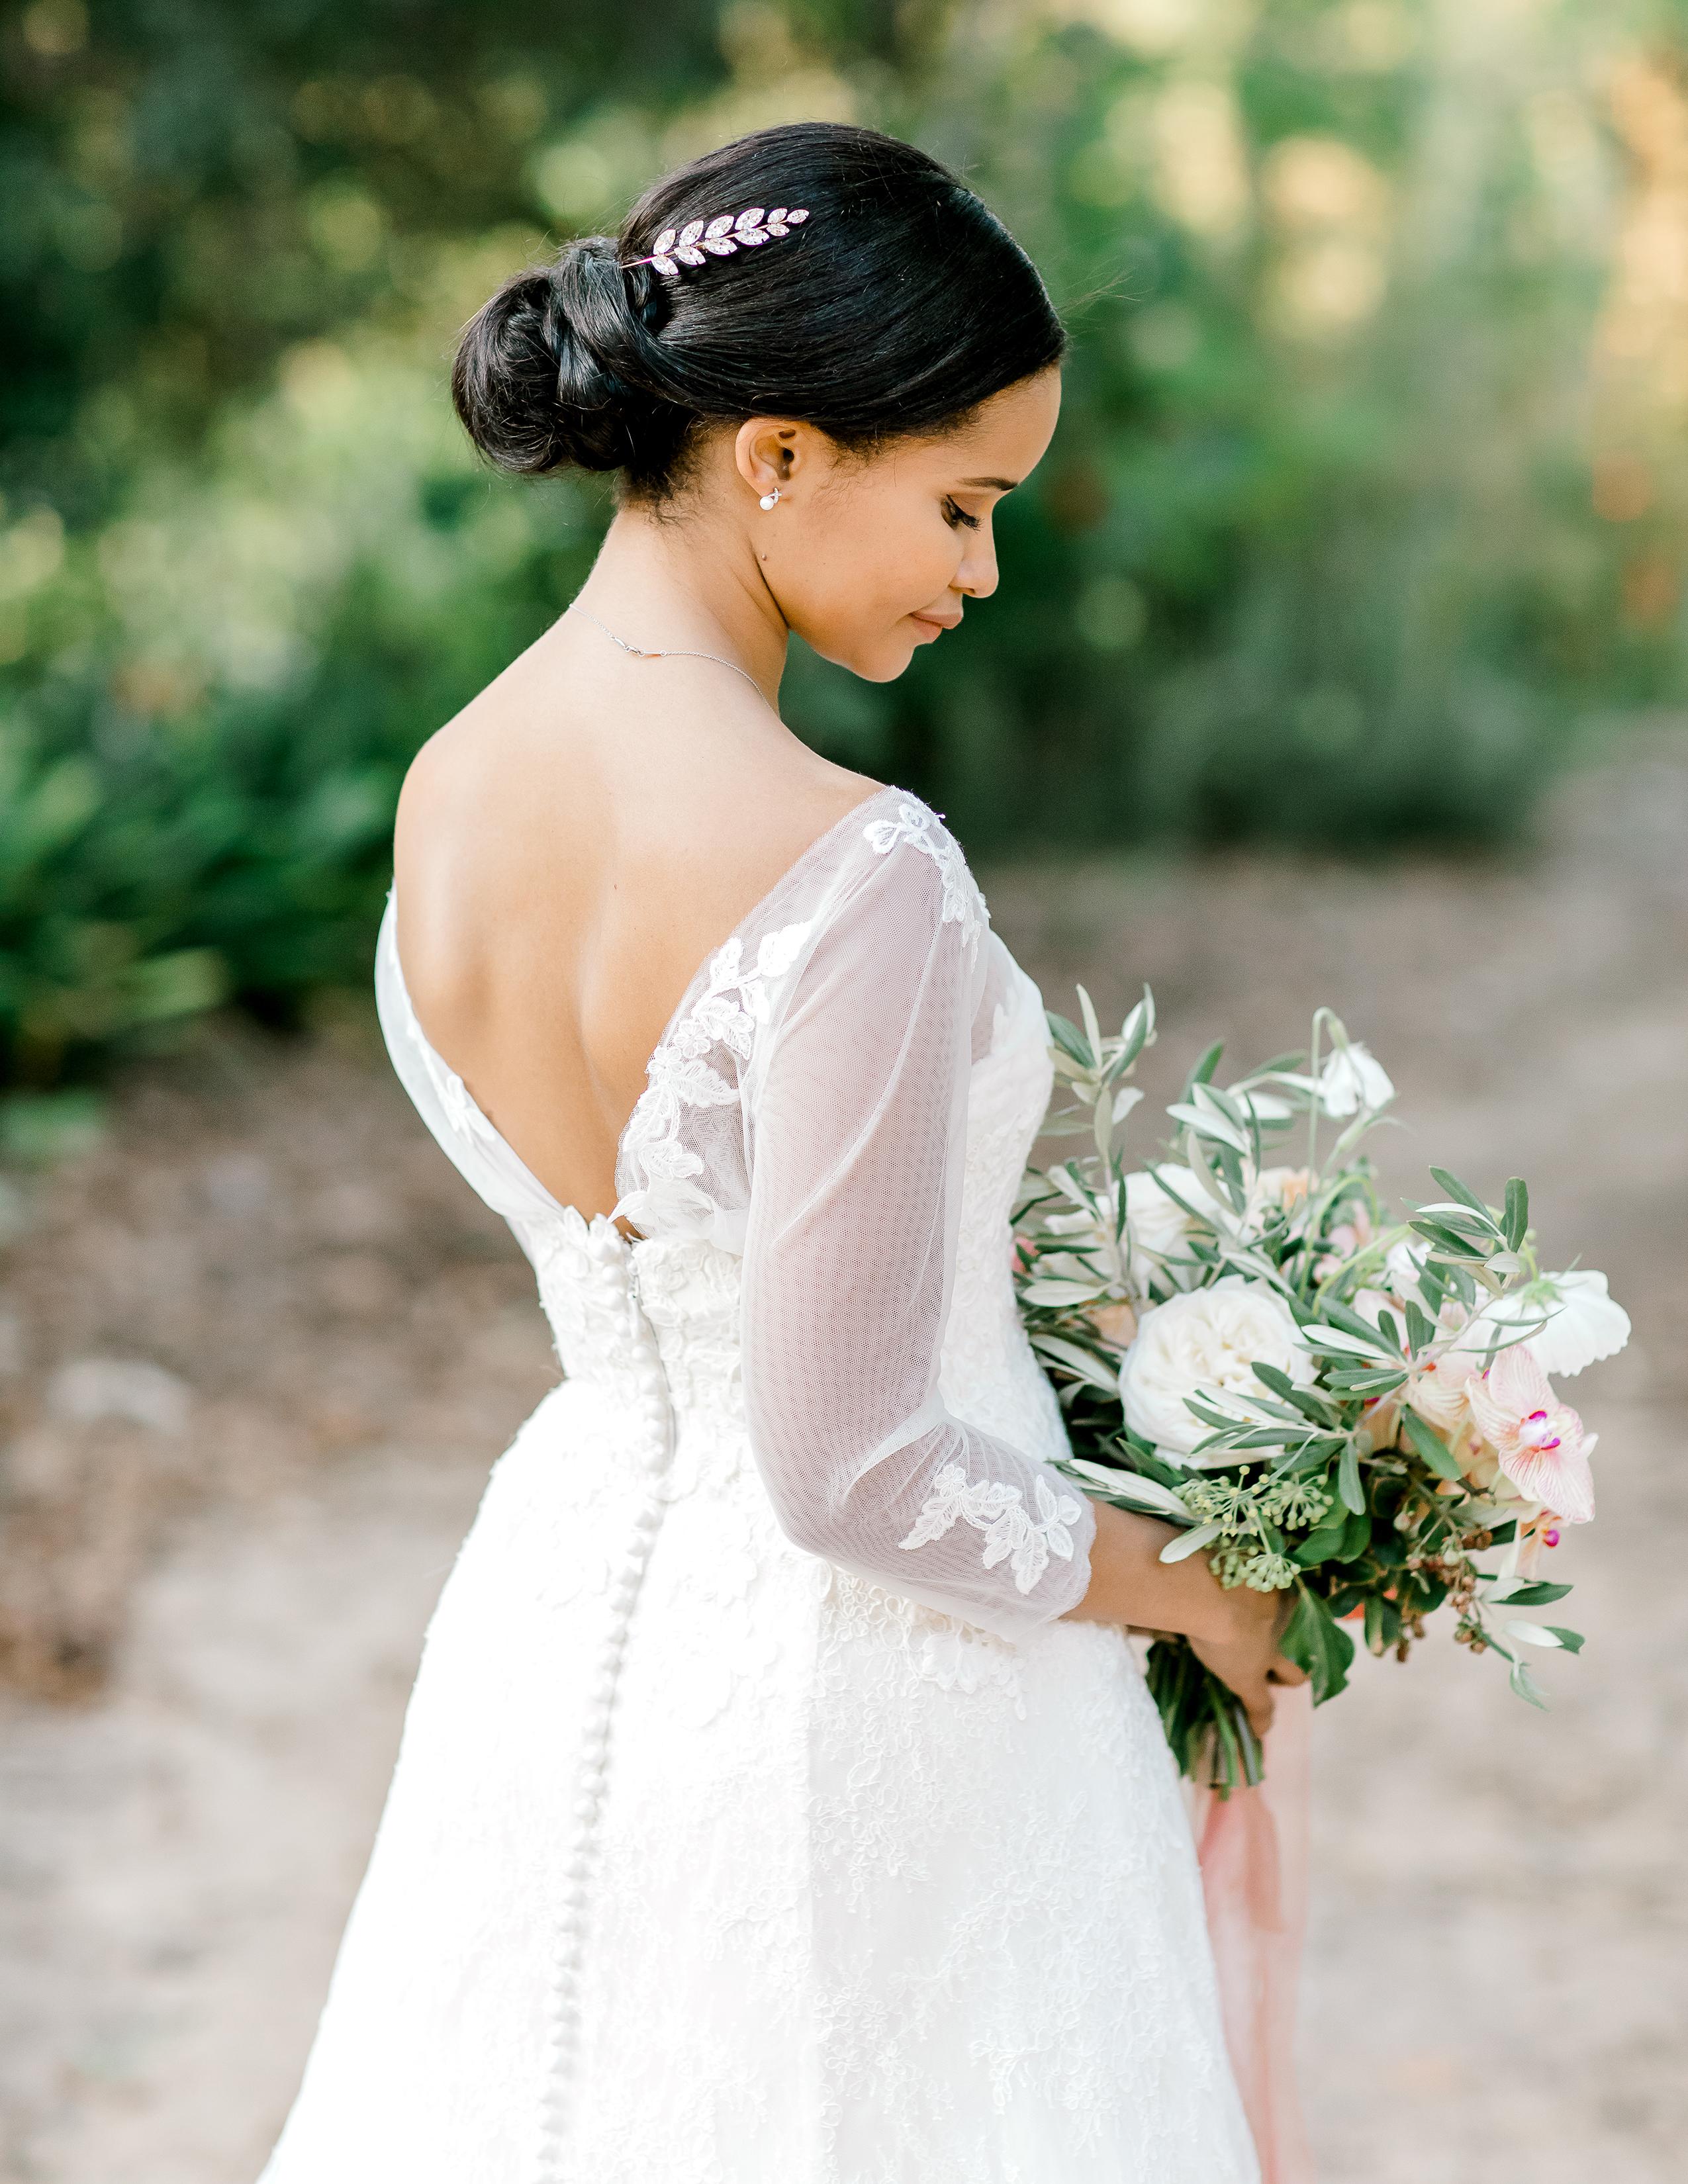 rorisang stephen bride hairpiece